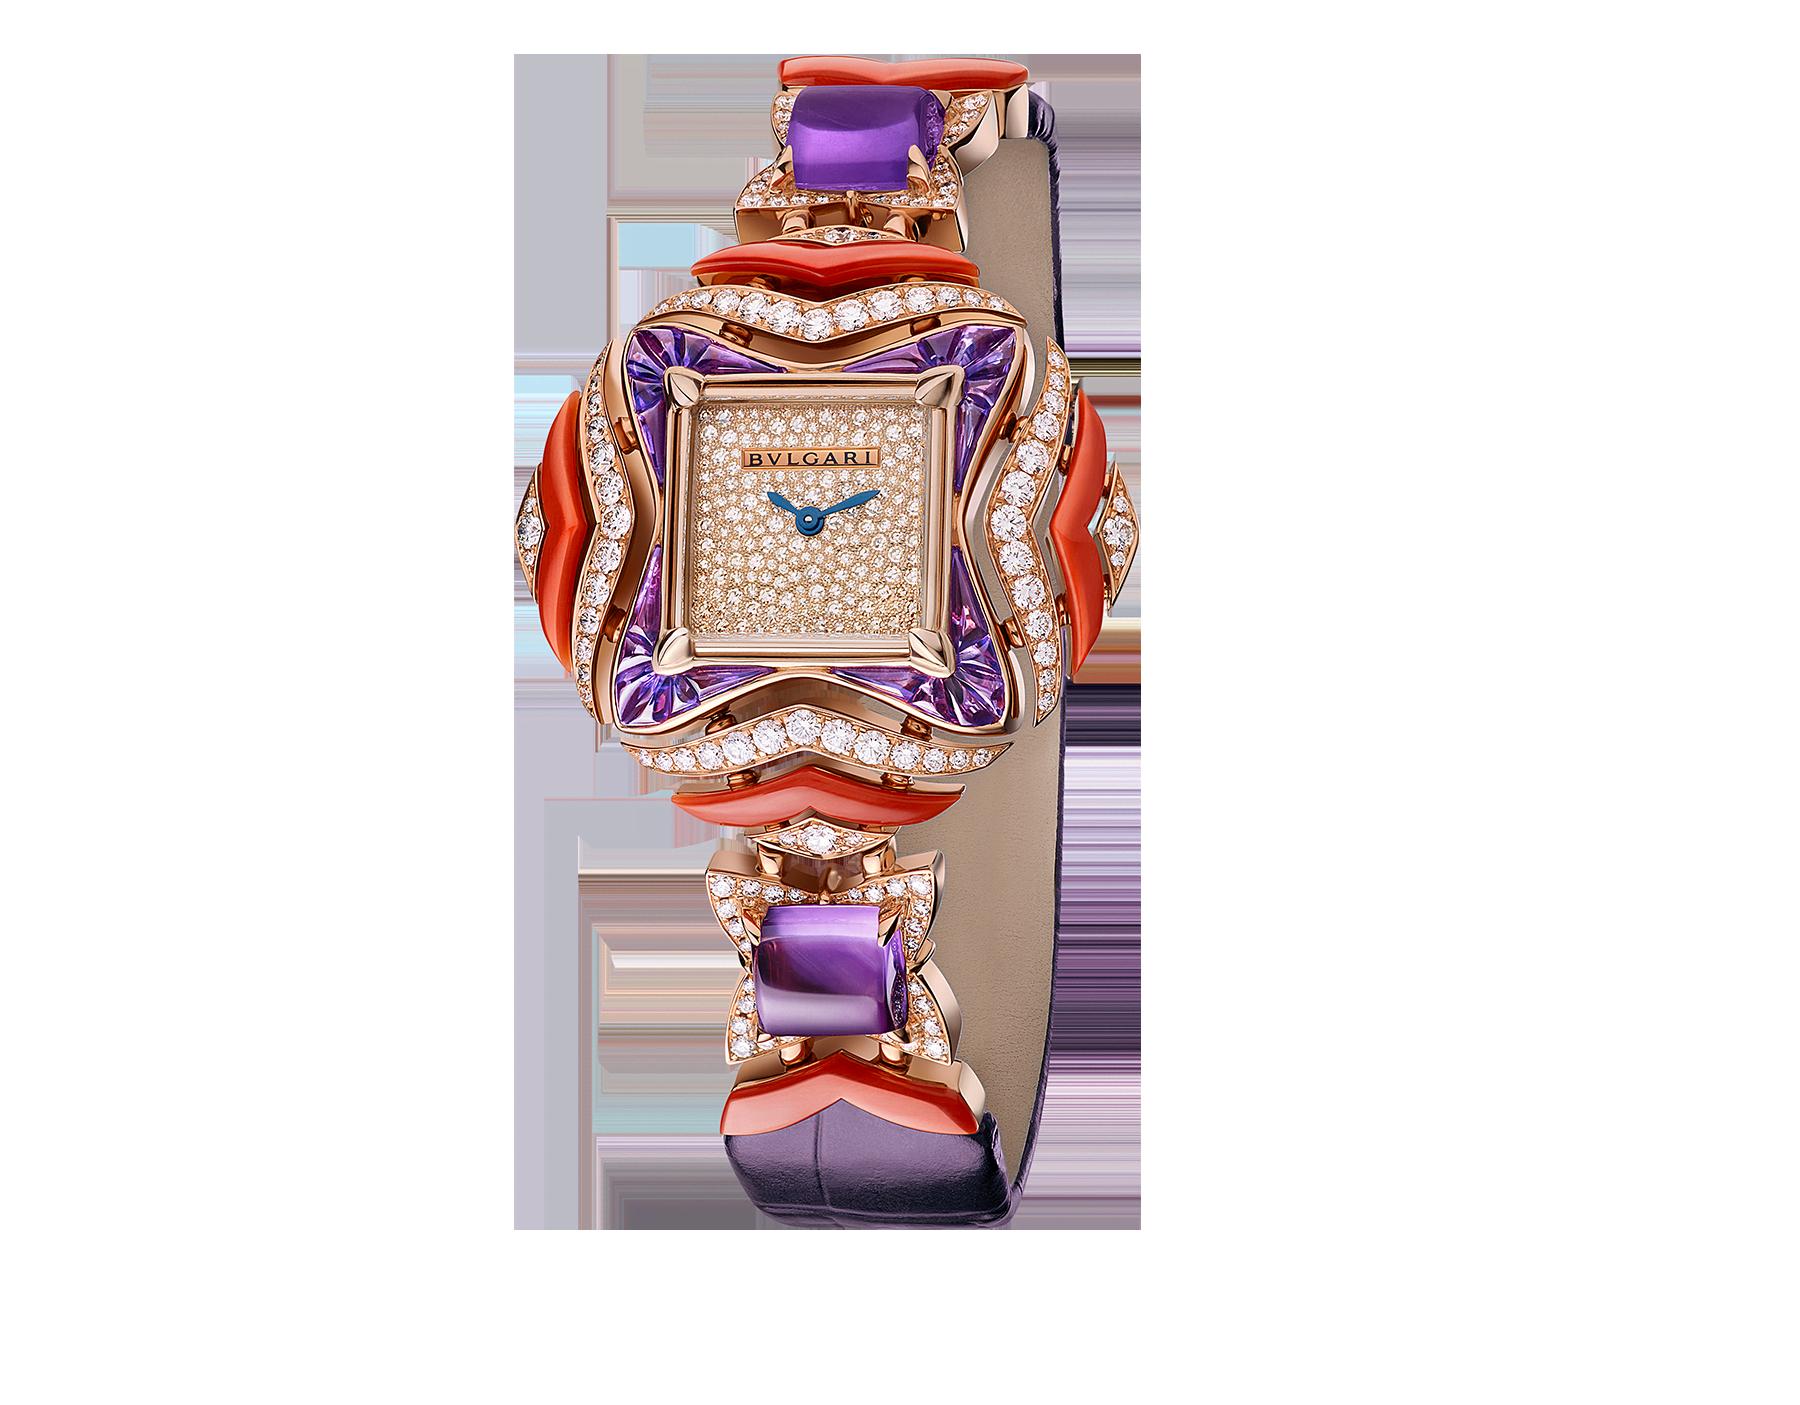 MVSA 腕錶,18K 玫瑰金錶殼和連接扣鑲飾明亮型切割鑽石、面包型和蛋面型切割紫水晶、珊瑚元素。雪花式密鑲鑽石錶盤,紫羅蘭色鱷魚皮錶帶。 102453 image 1